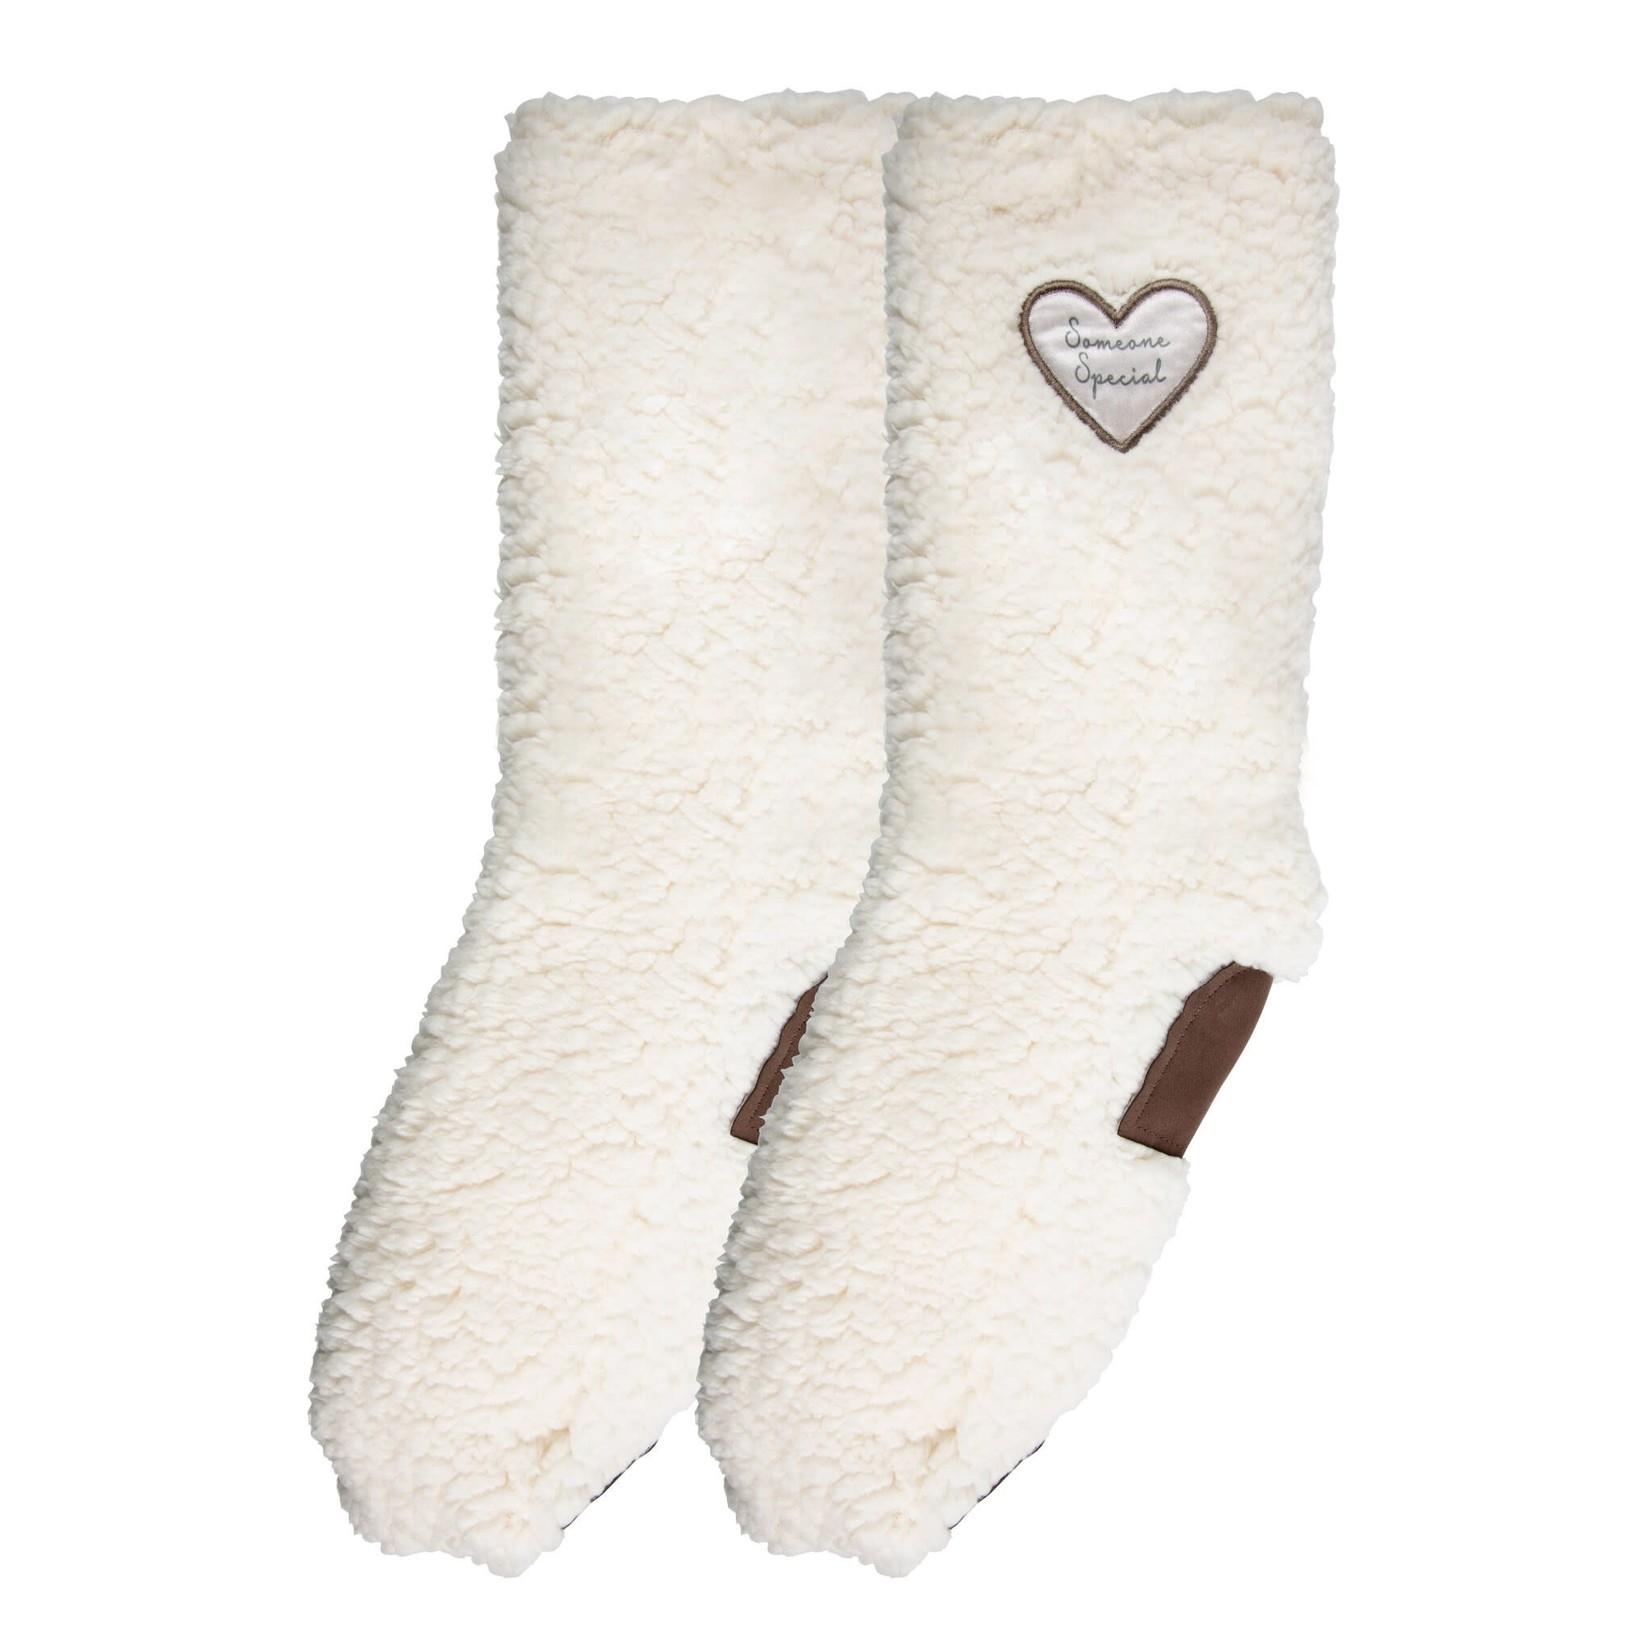 Sherpa Slipper Sock